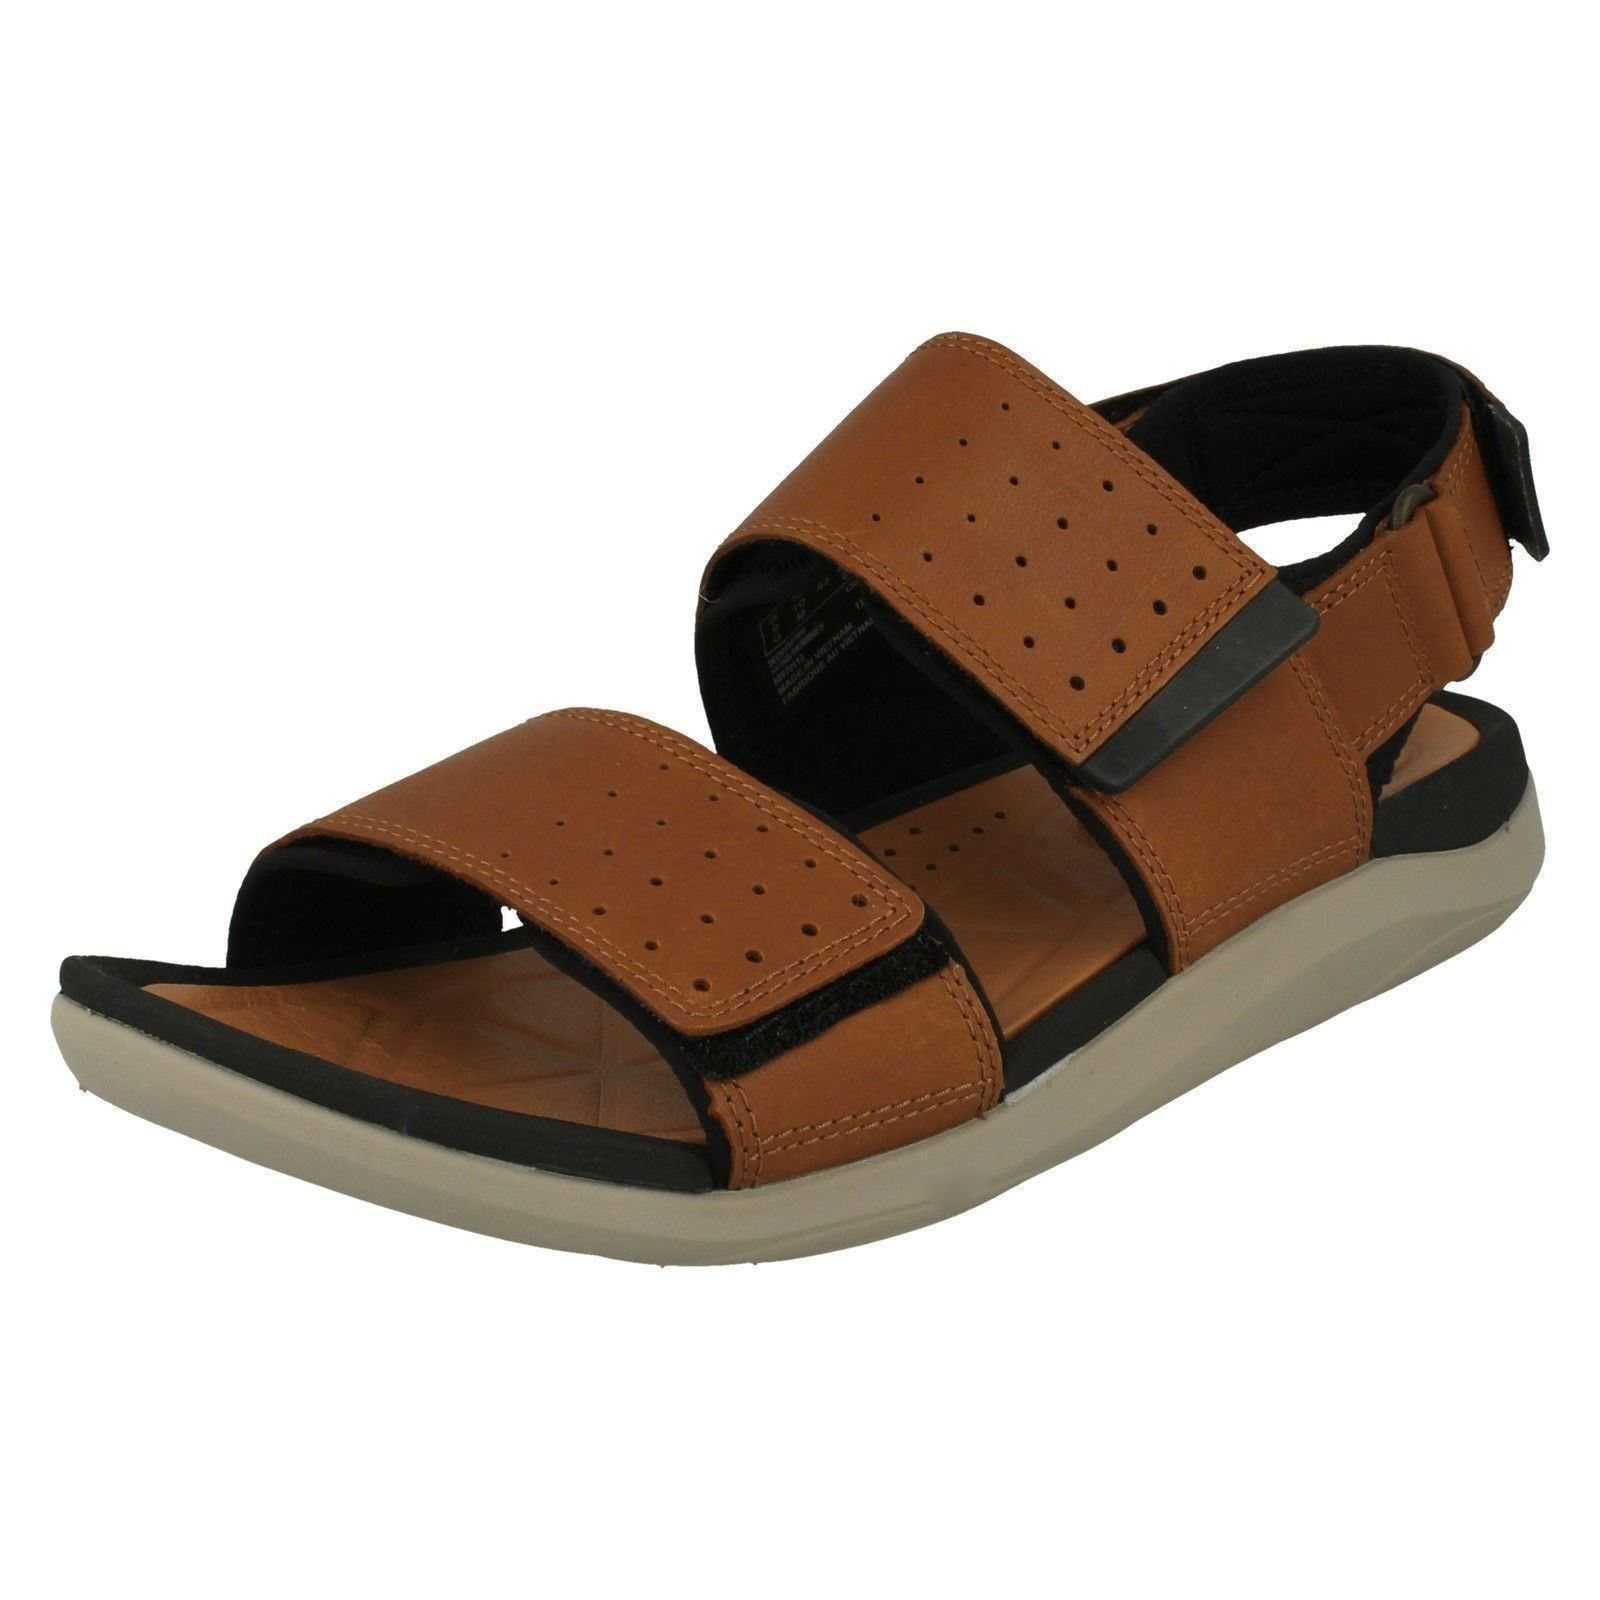 Men's Clarks Leather Sandals Open Toe Casual  Sandals Leather Style - Garratt Active 92c53c